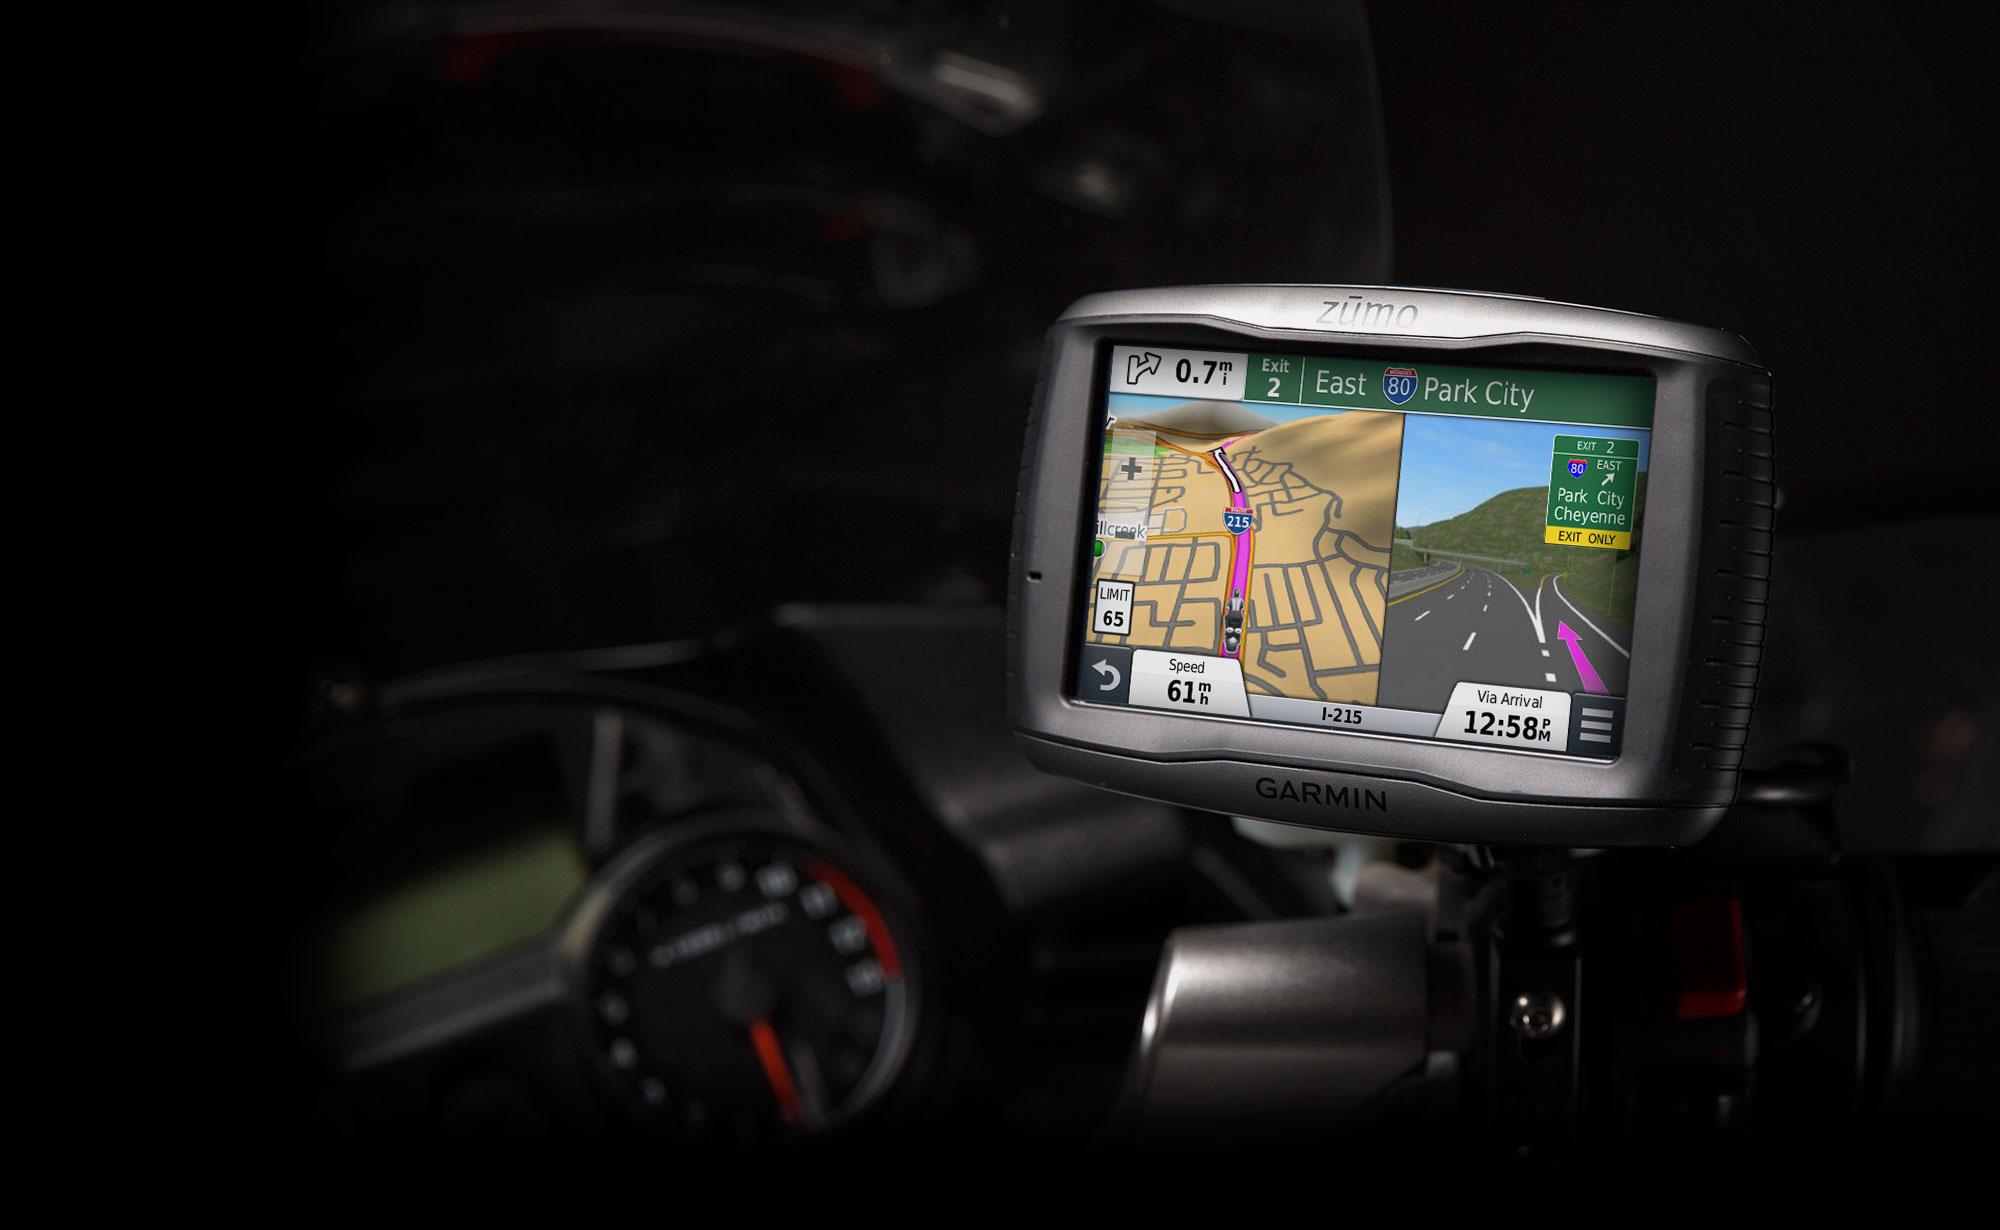 garmin reveals zumo 590lm premium motorcycle gps autoevolution. Black Bedroom Furniture Sets. Home Design Ideas